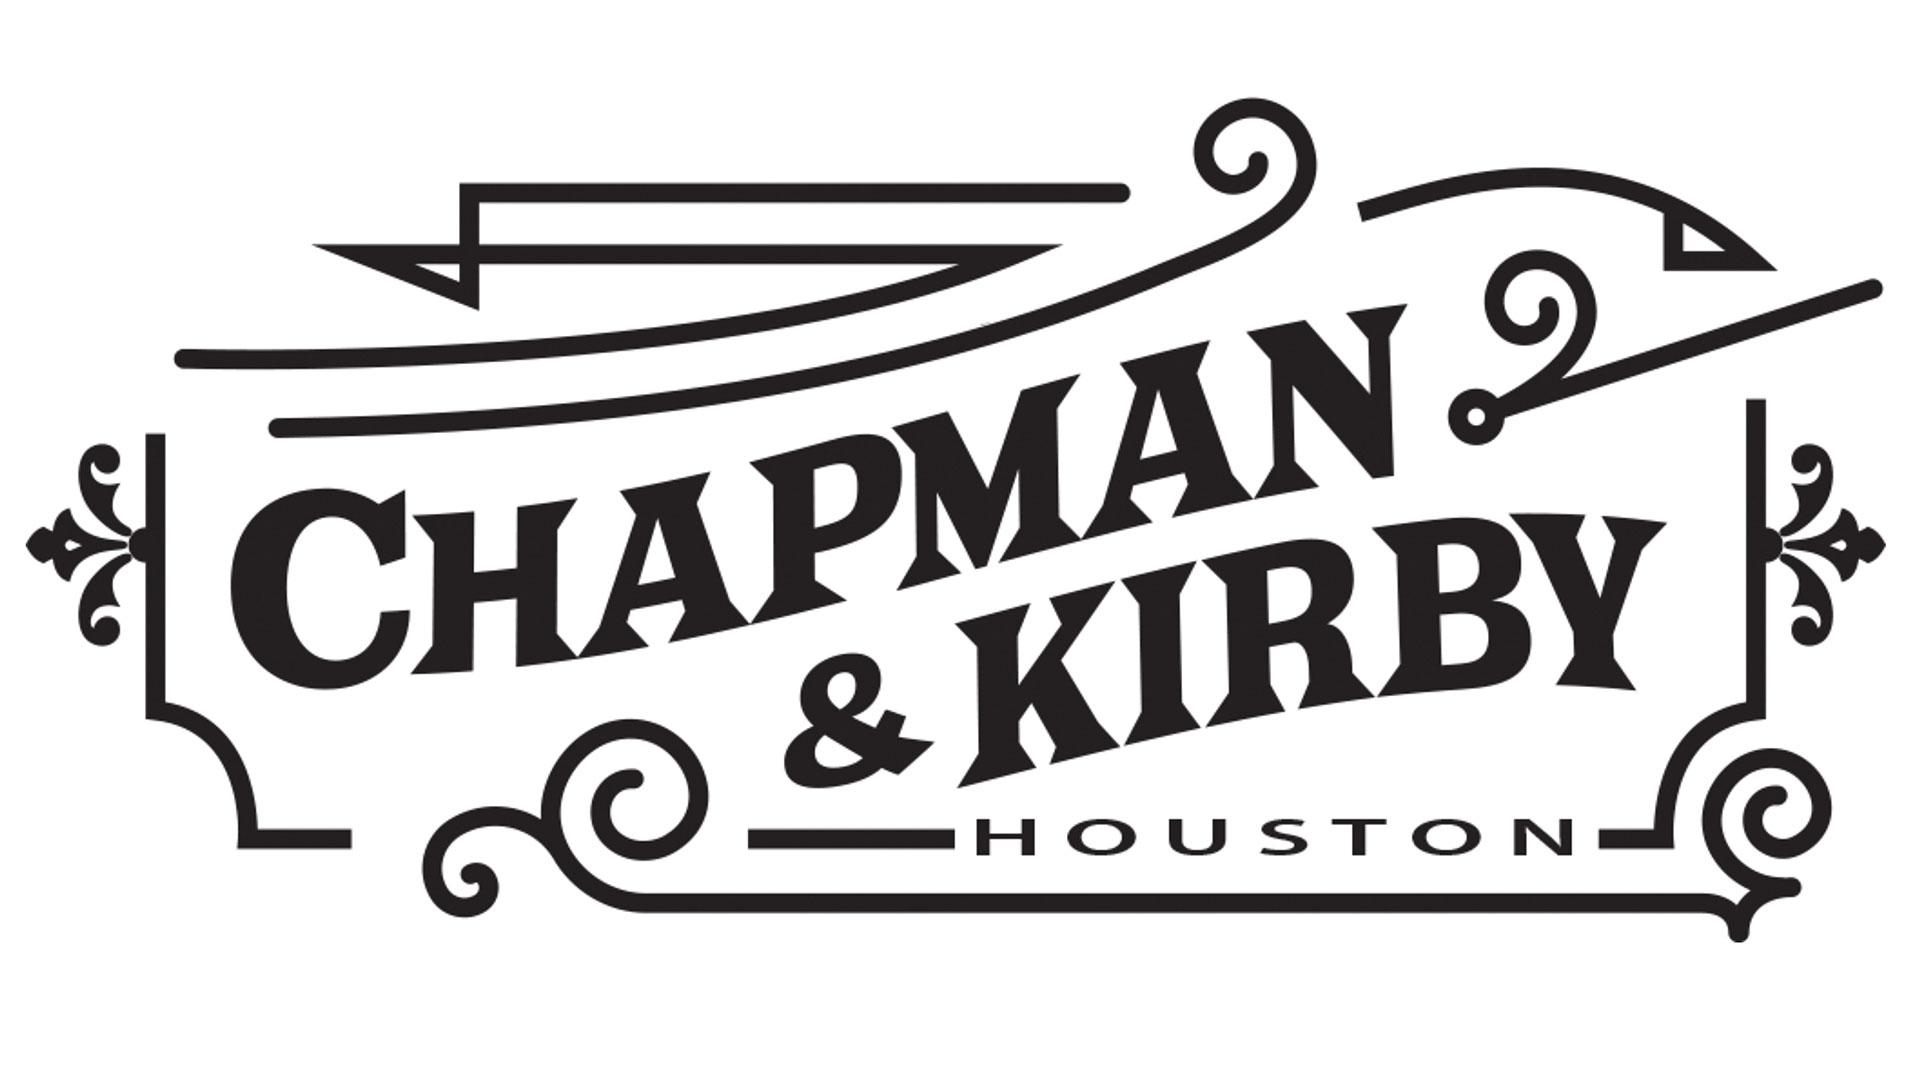 Chapman & Kirby